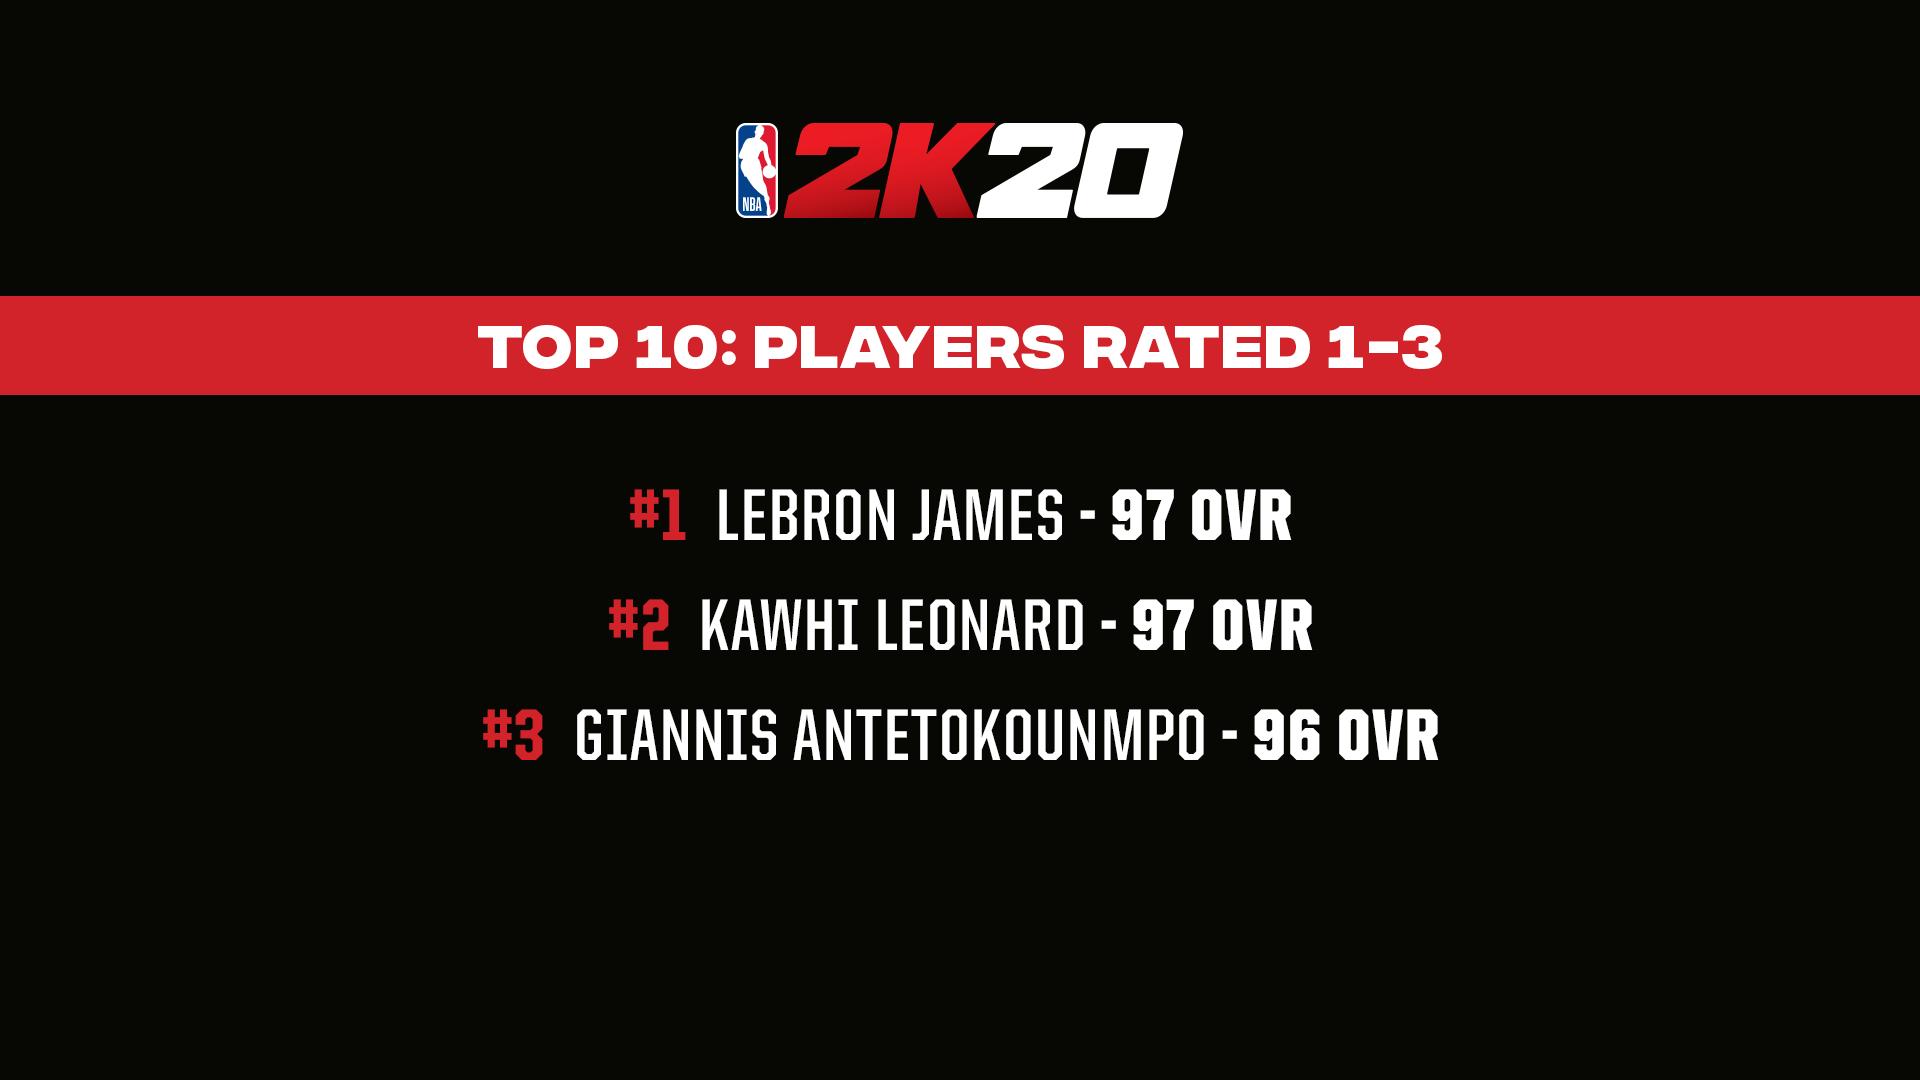 《NBA 2K20》明星球员评分公布!老詹连续10年评分最高 第2张